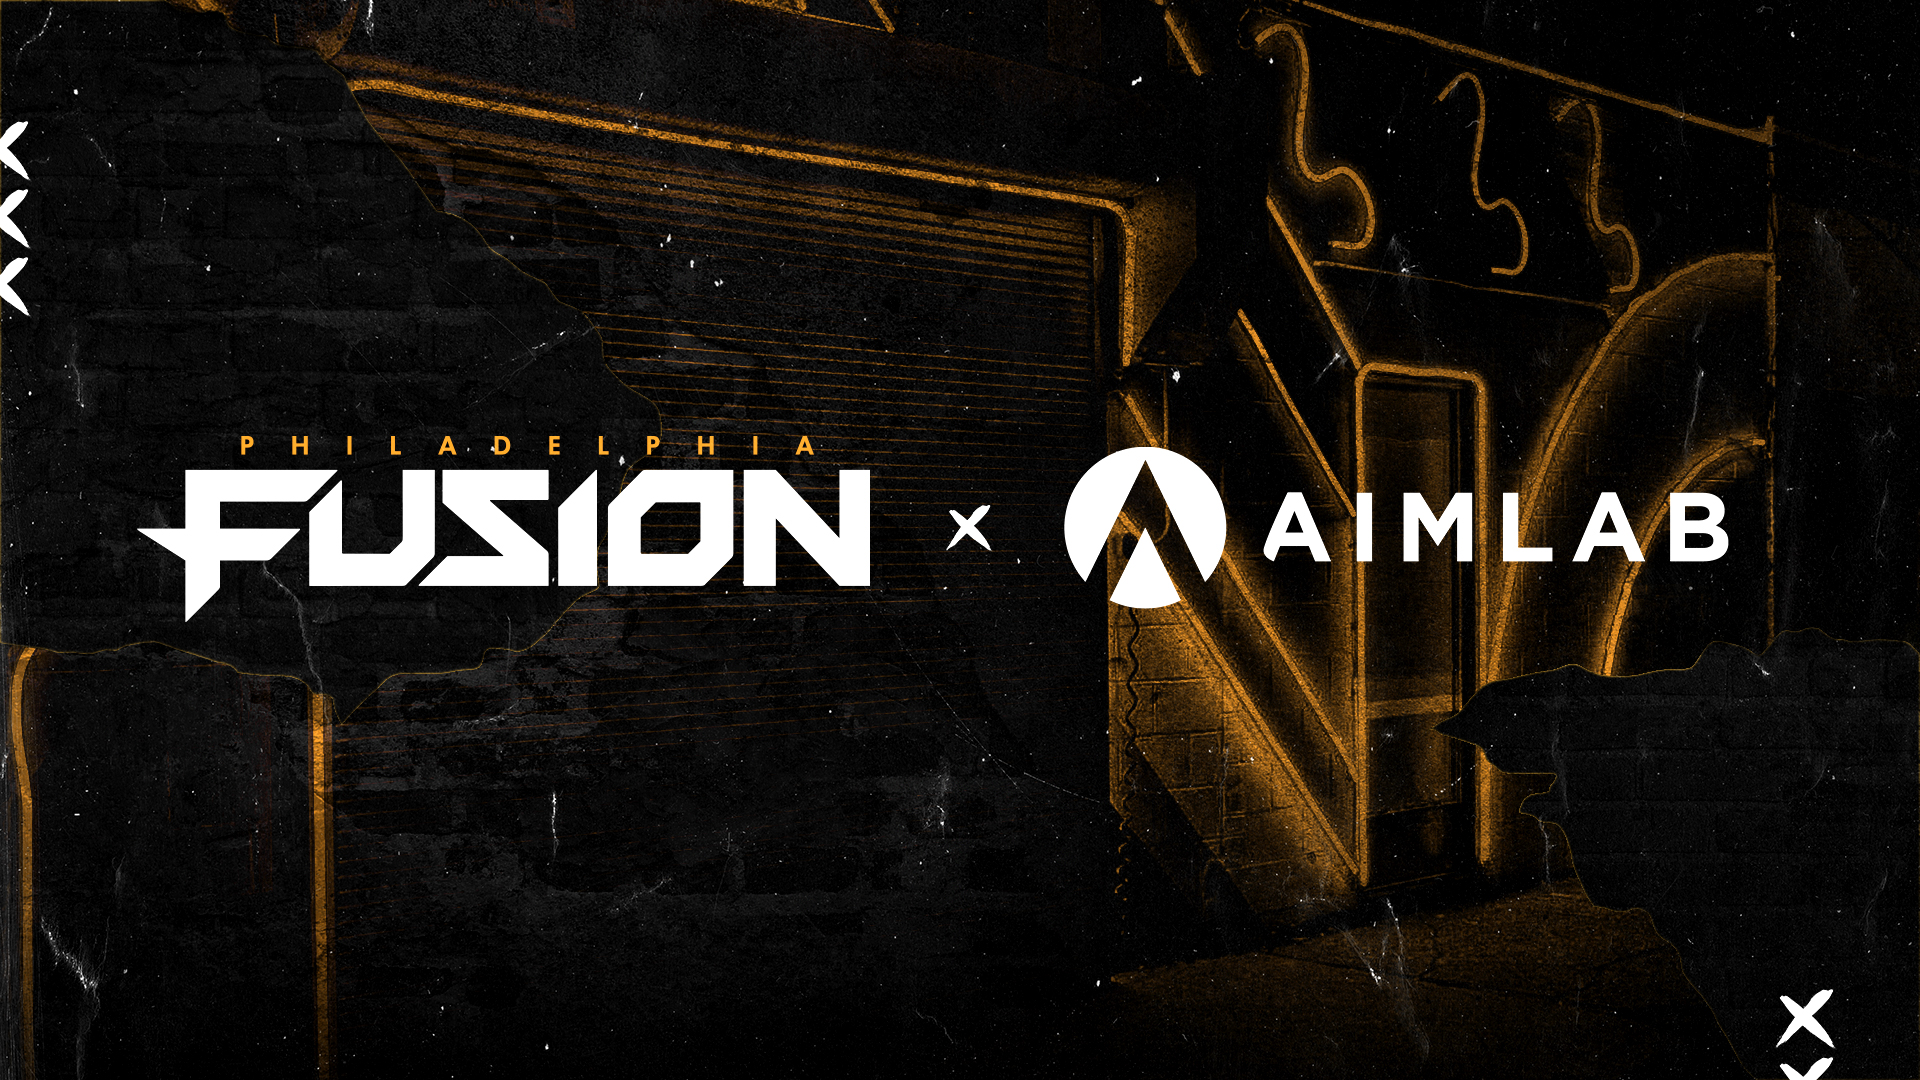 Philadelphia Fusion adds Aim Lab